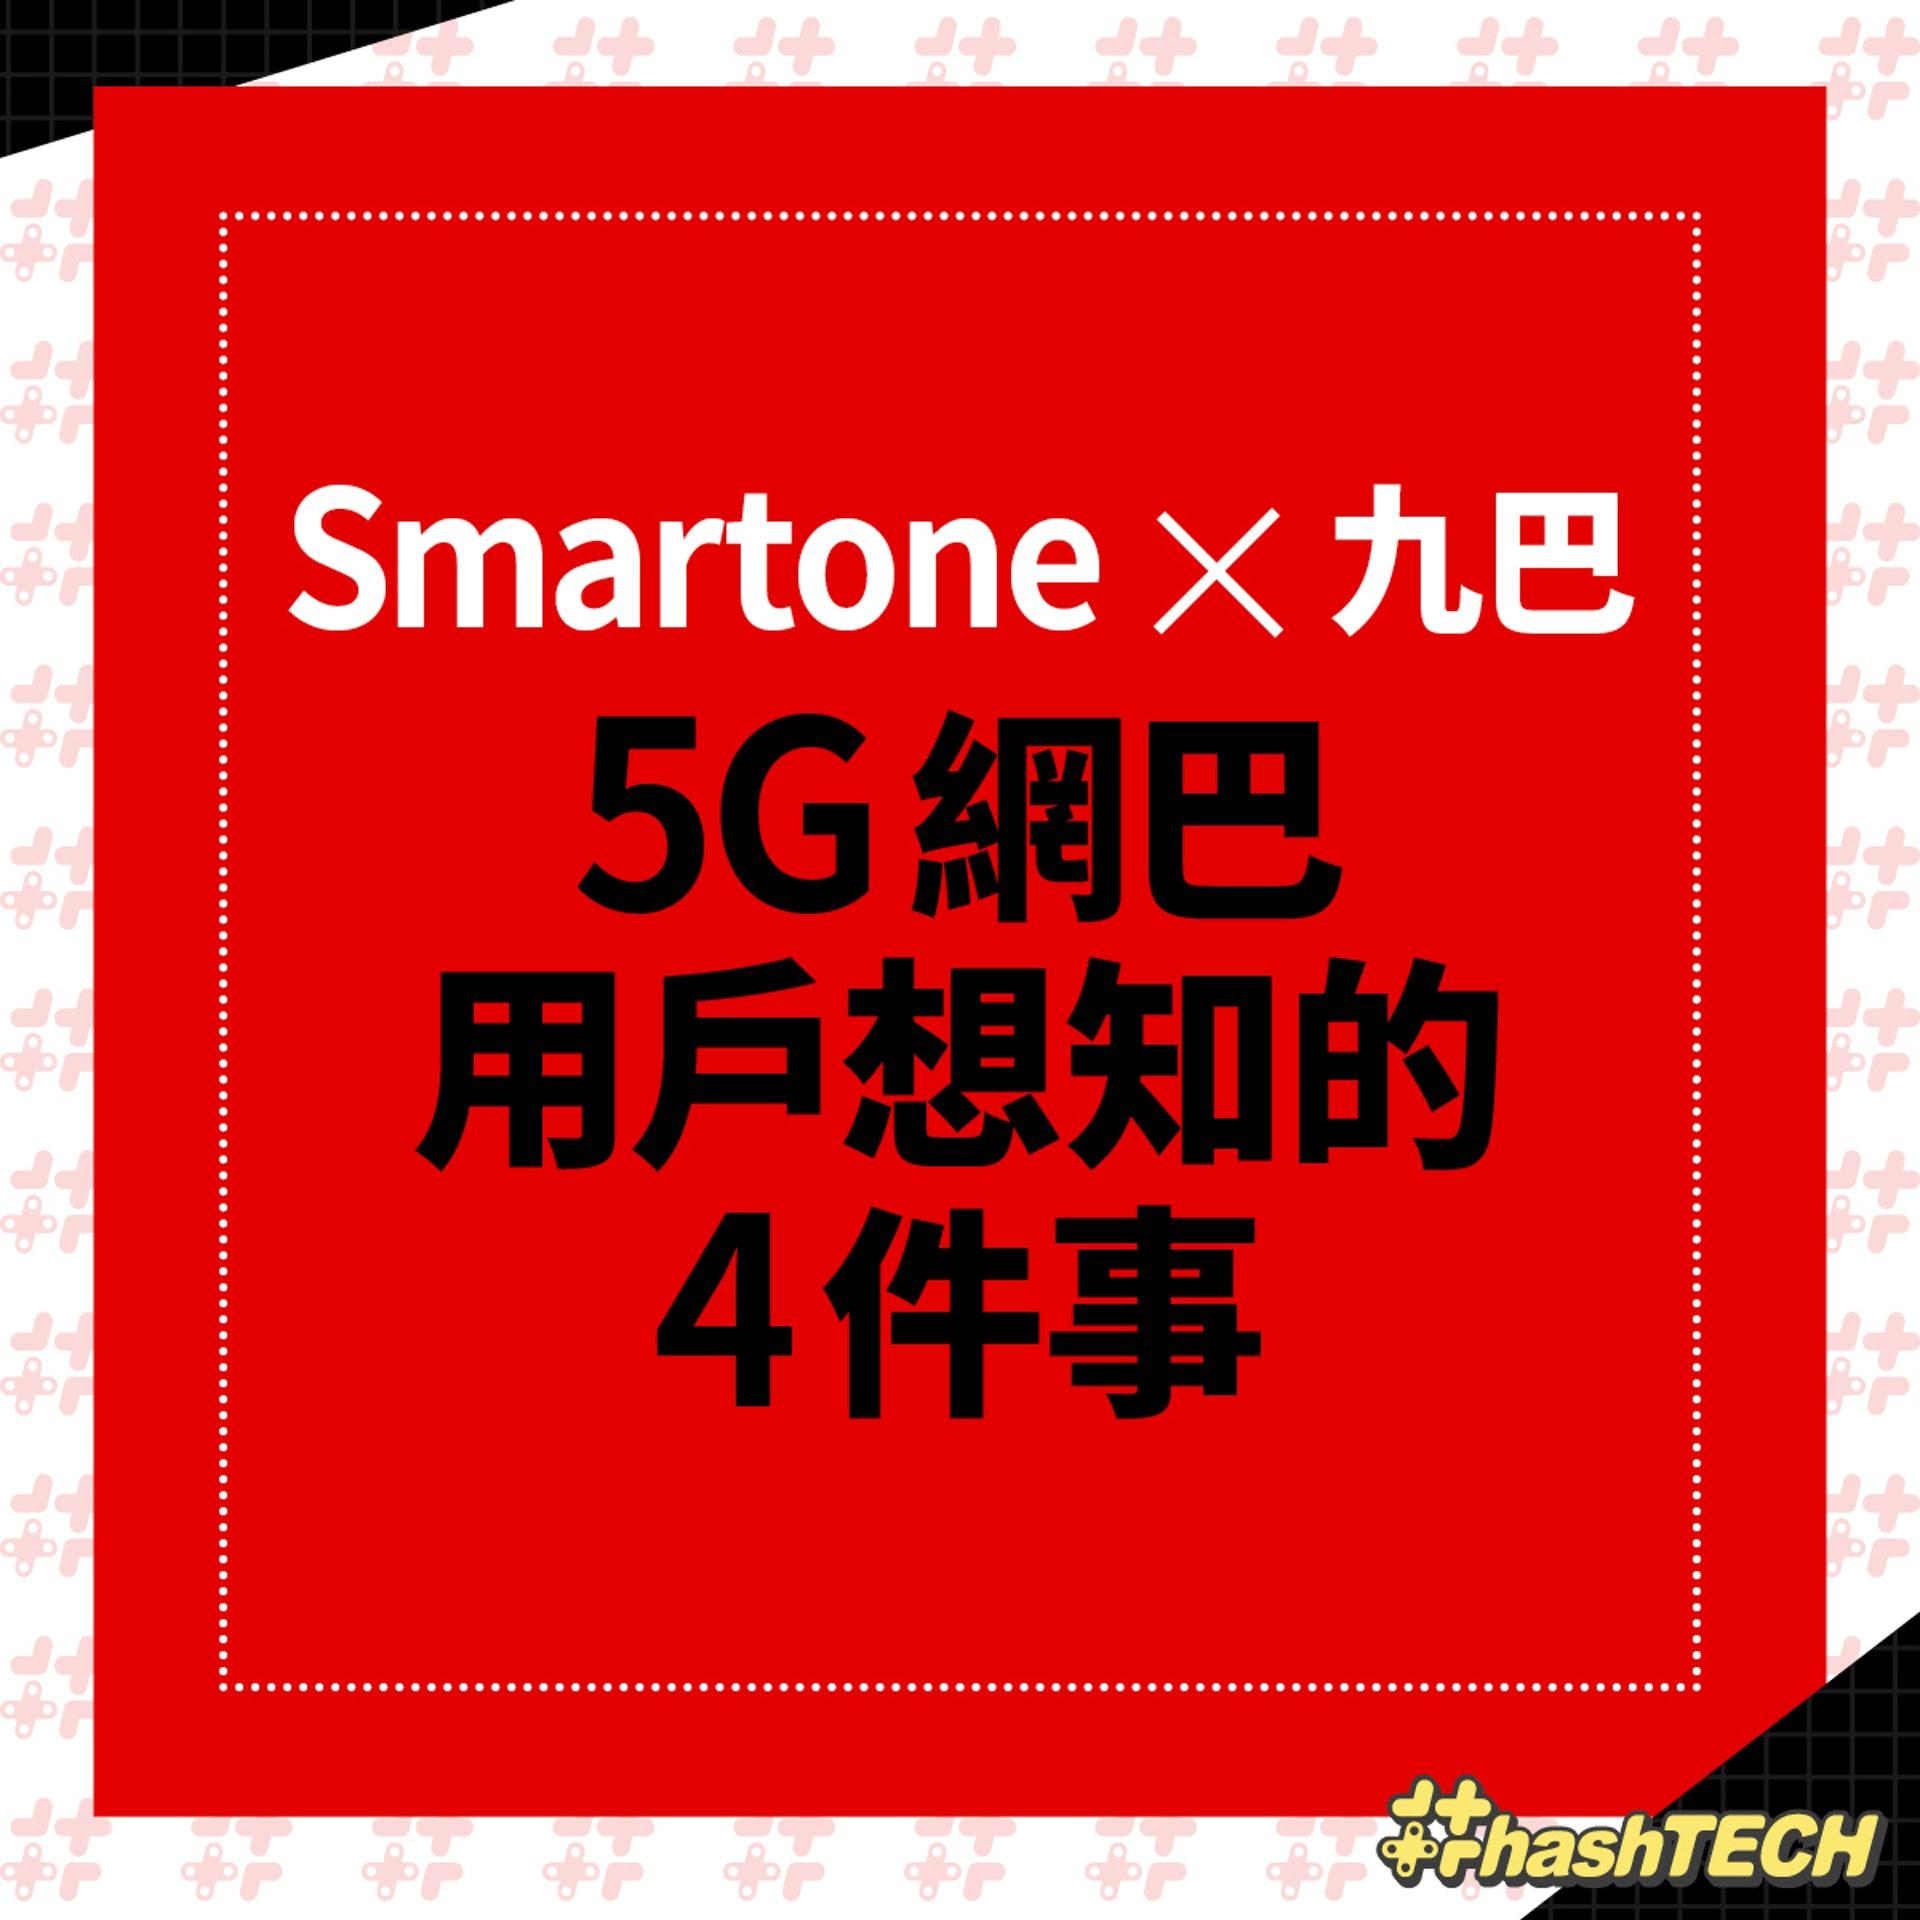 KMB x Smartone 5G 巴士 Wi-Fi 用戶必知 4 點